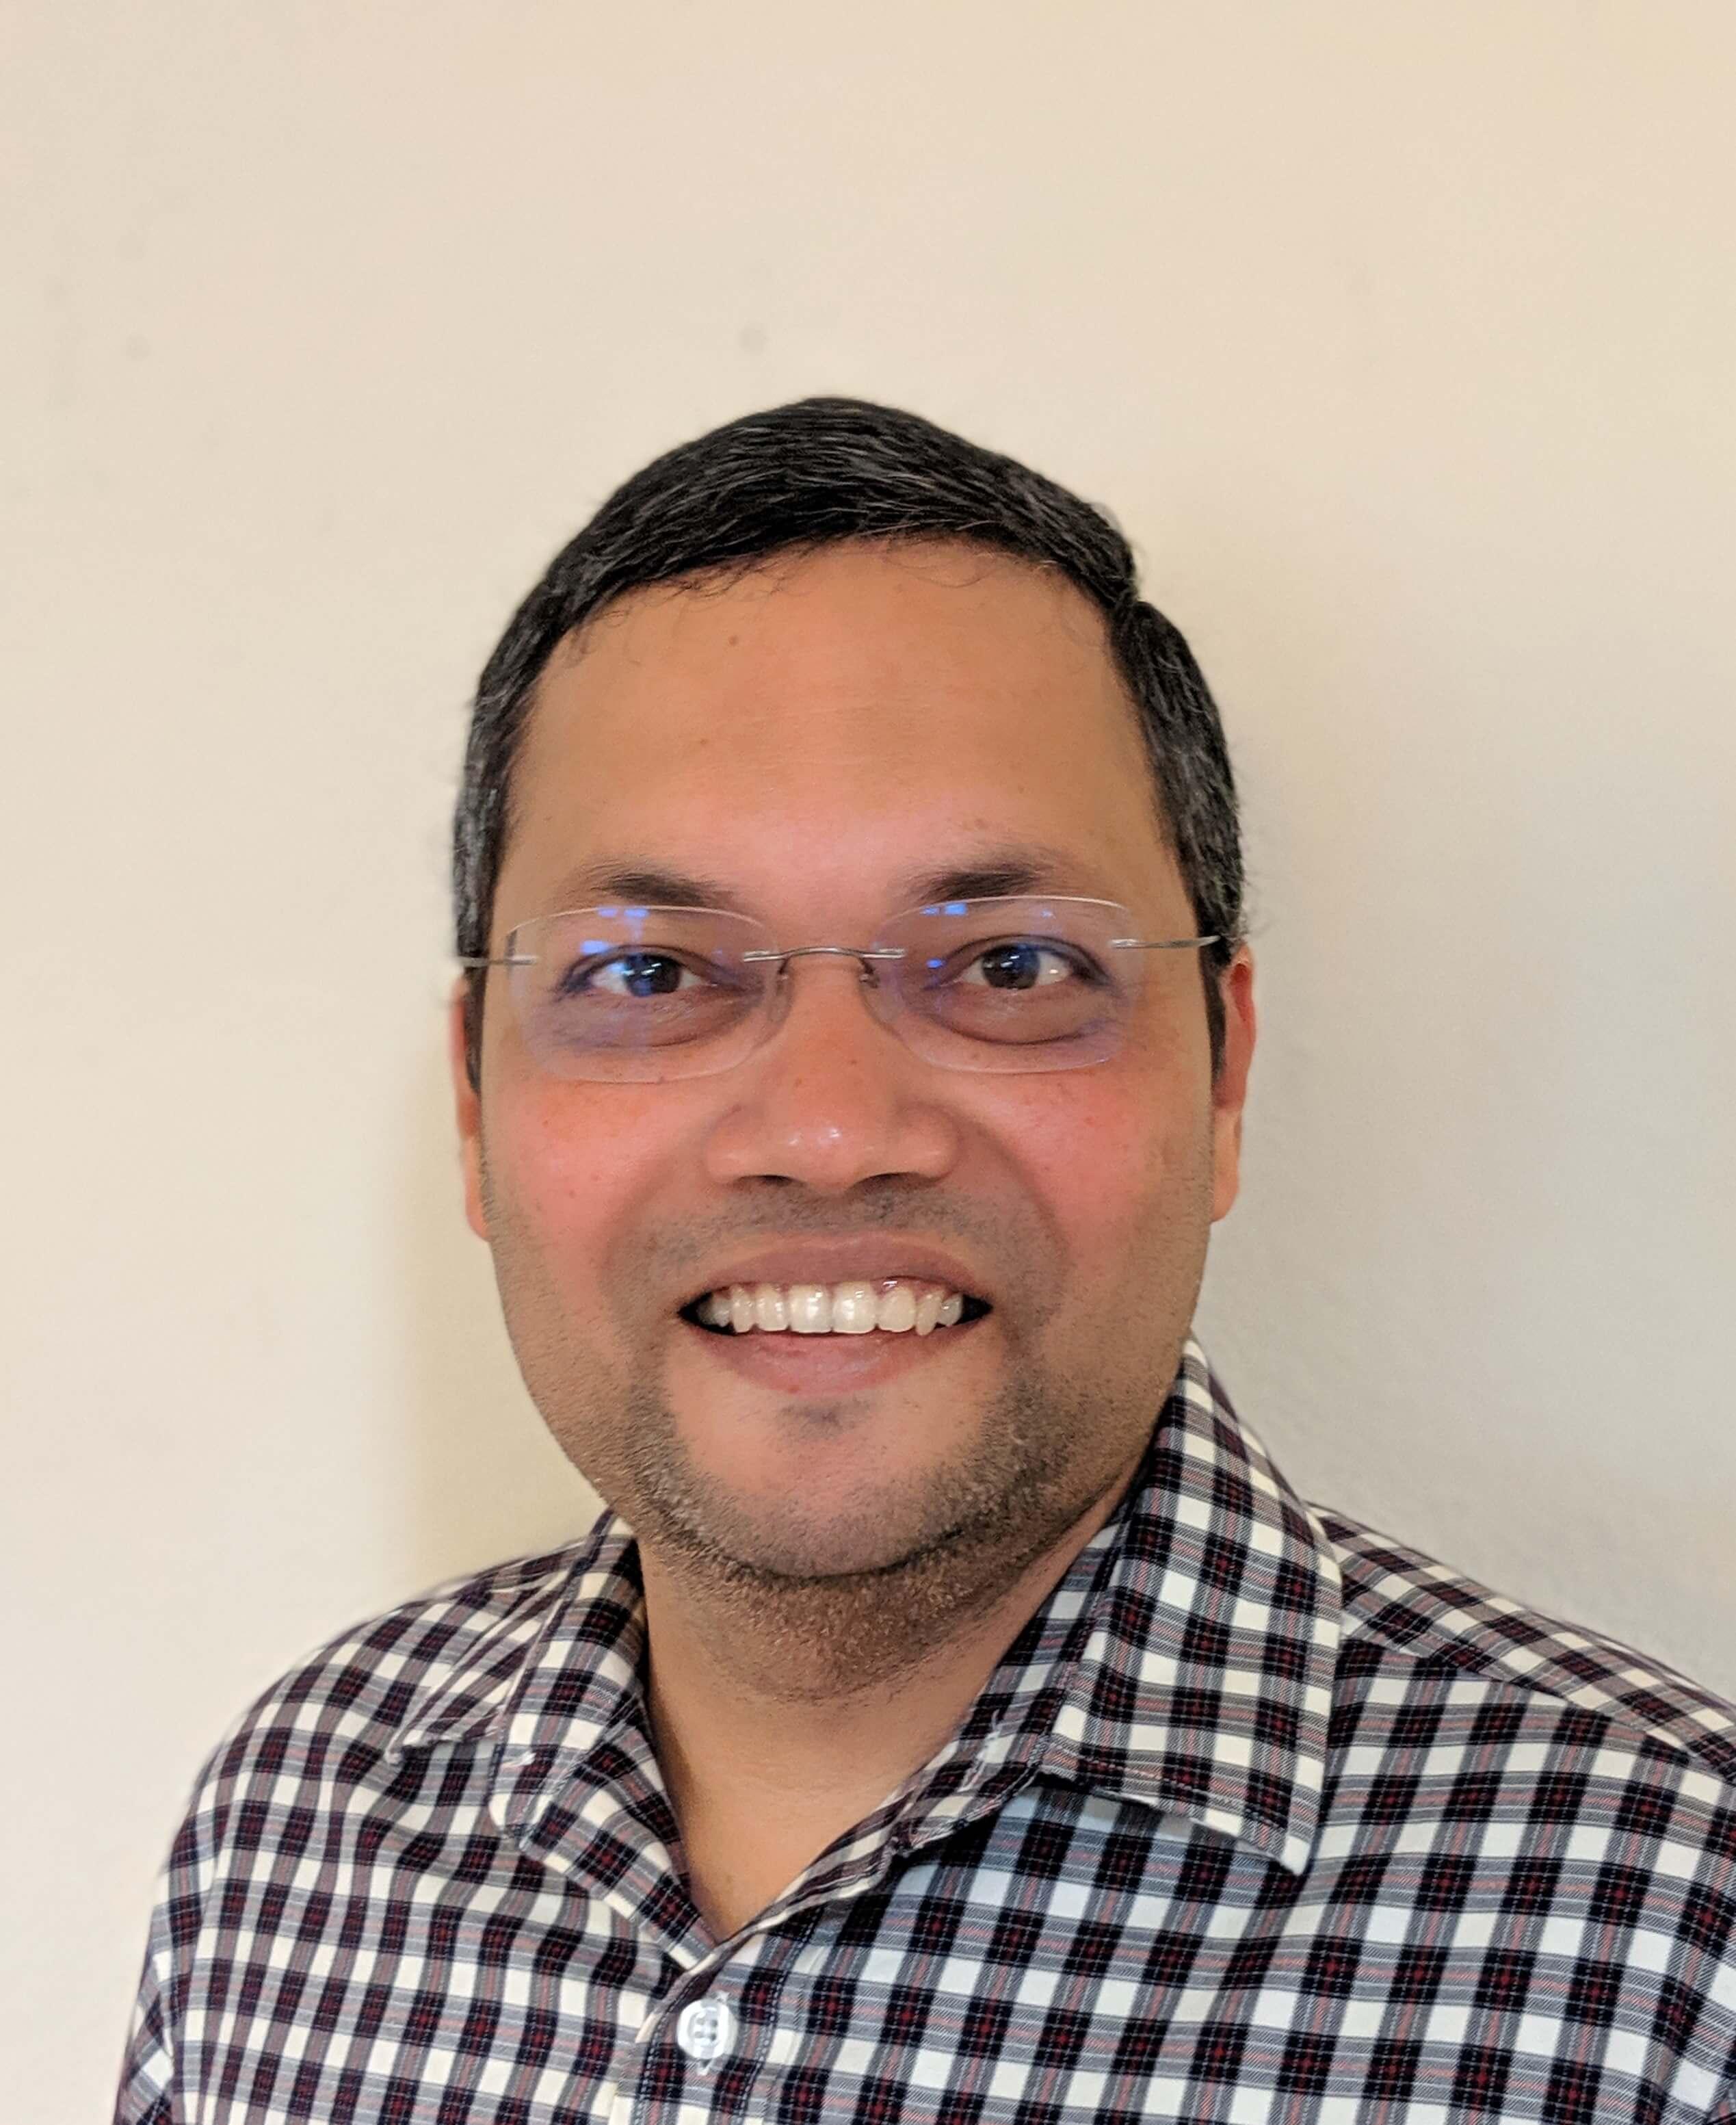 Headshot of Amirth Ramakrishnan